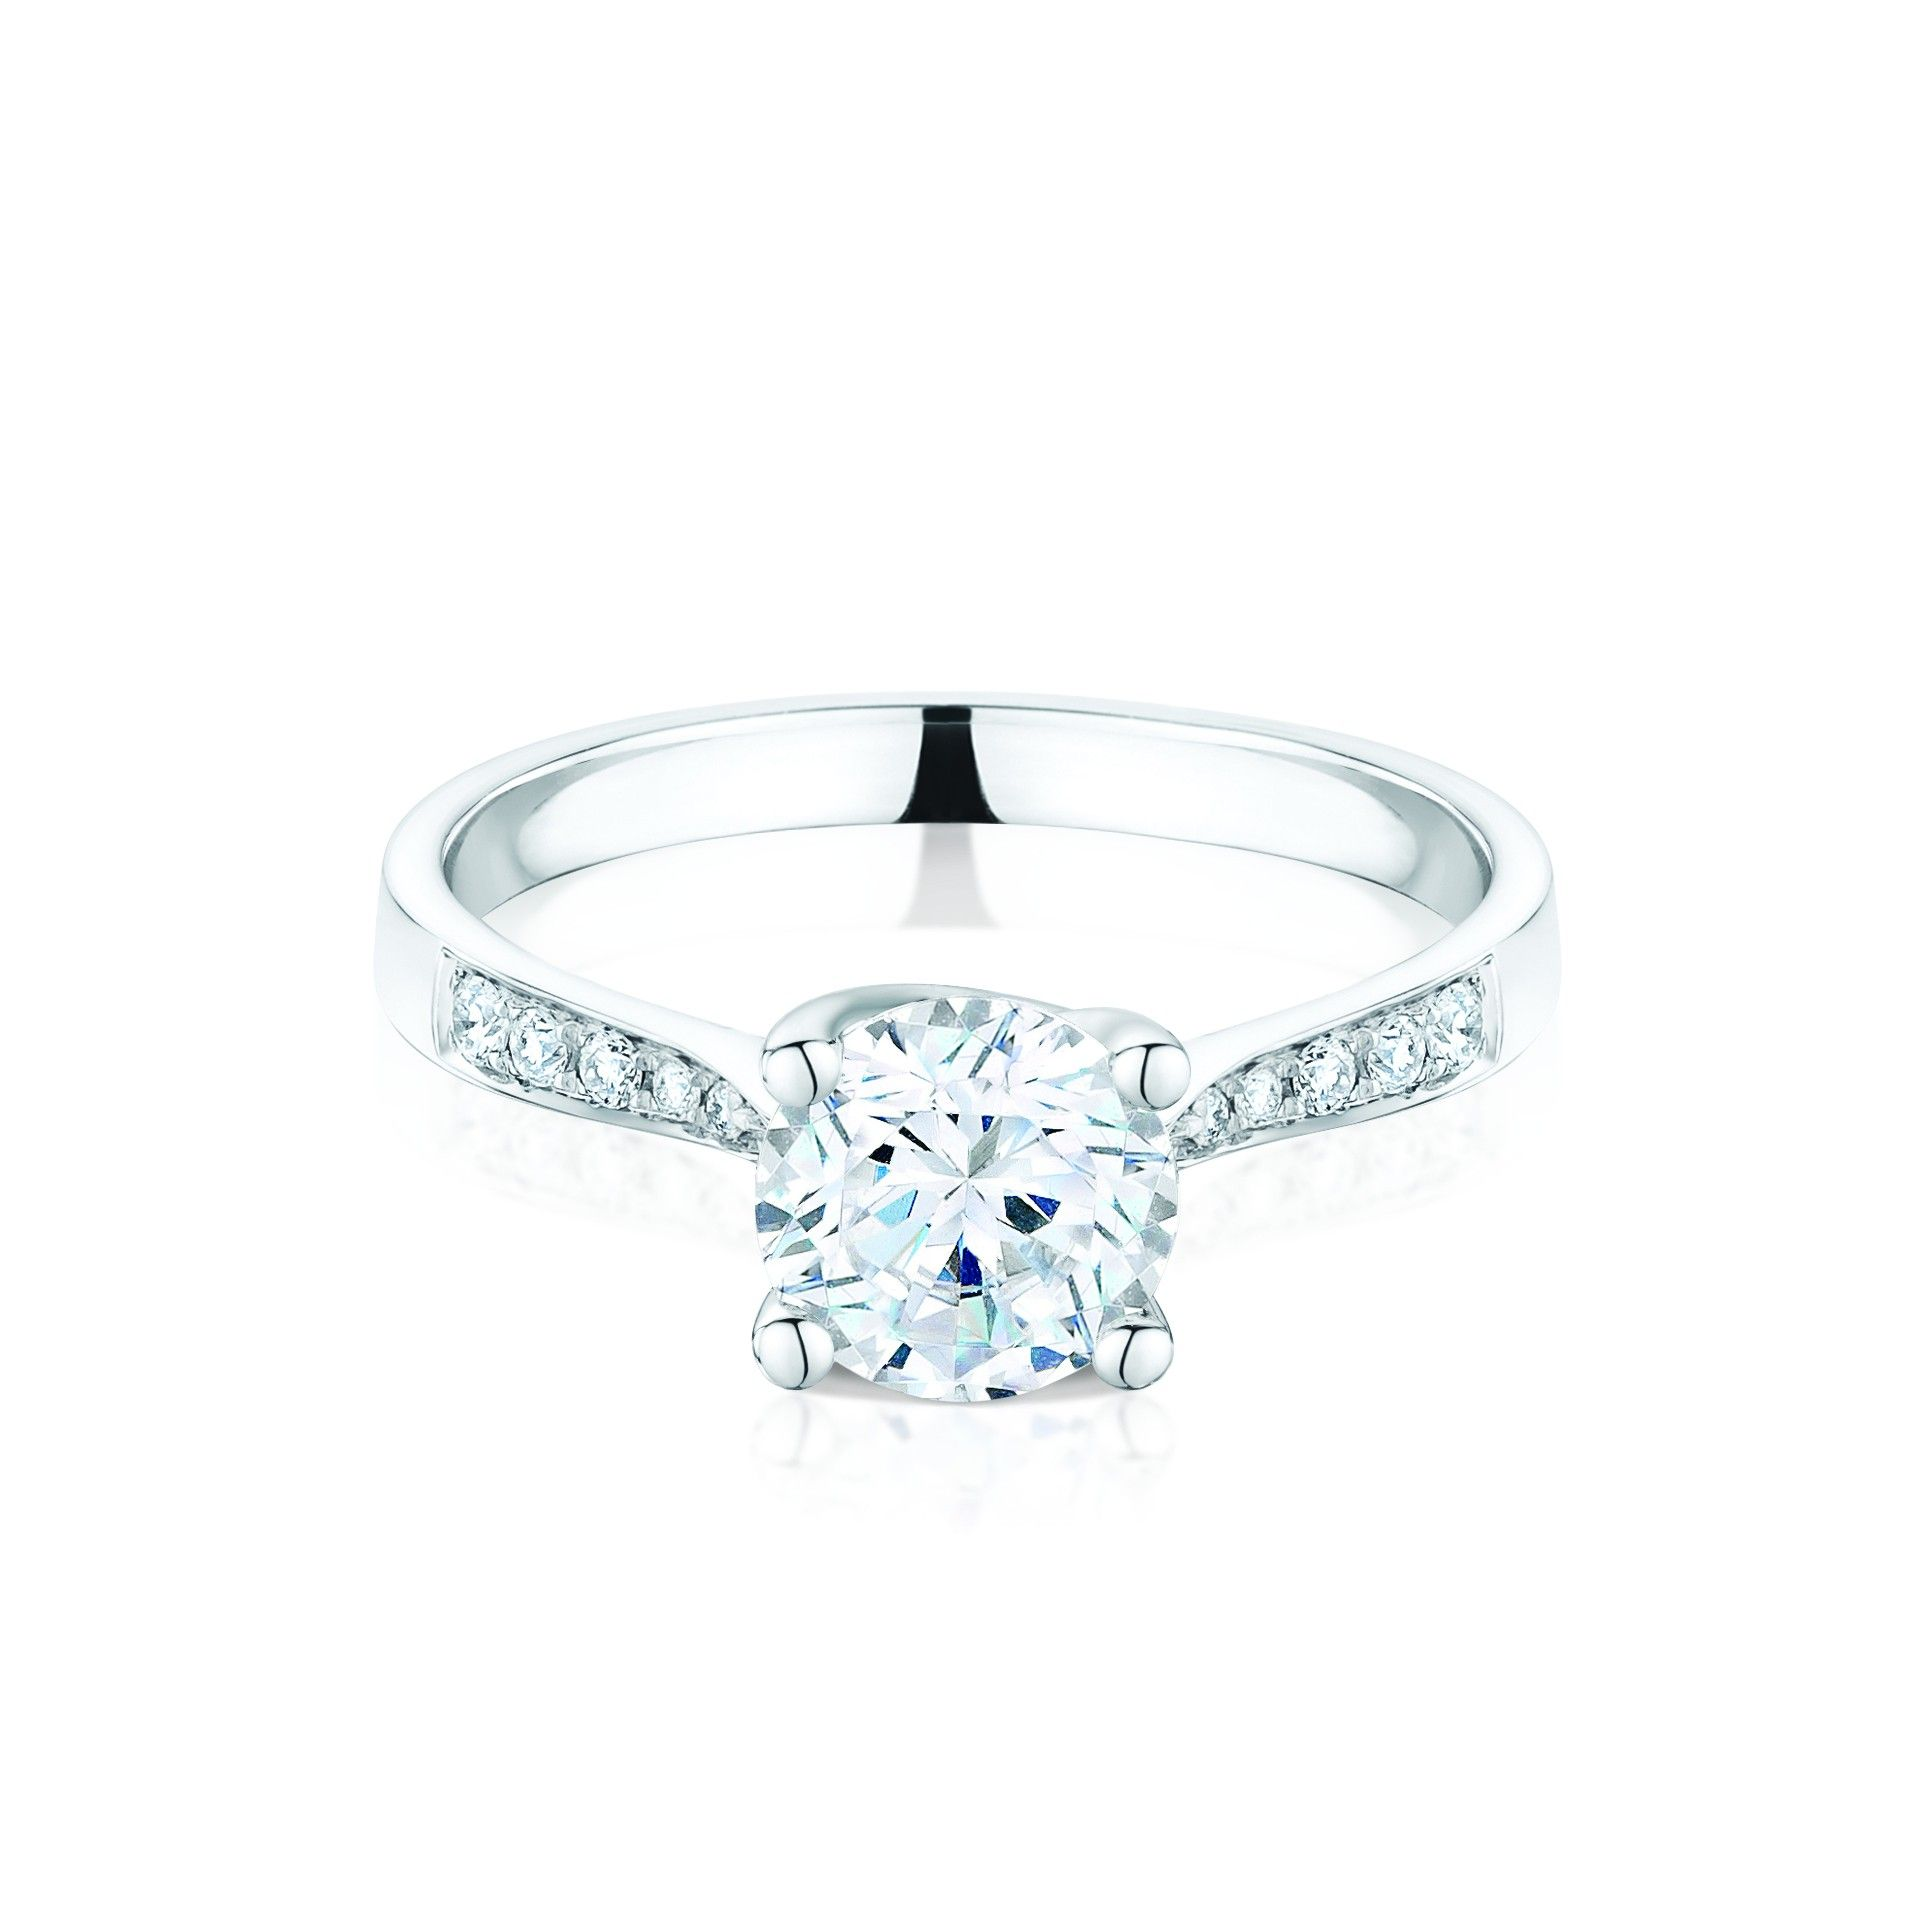 Esme Platinum 1.03ct Diamond Solitaire Ring With Diamond Set Shoulders - Jewellery - Laing Edinburgh